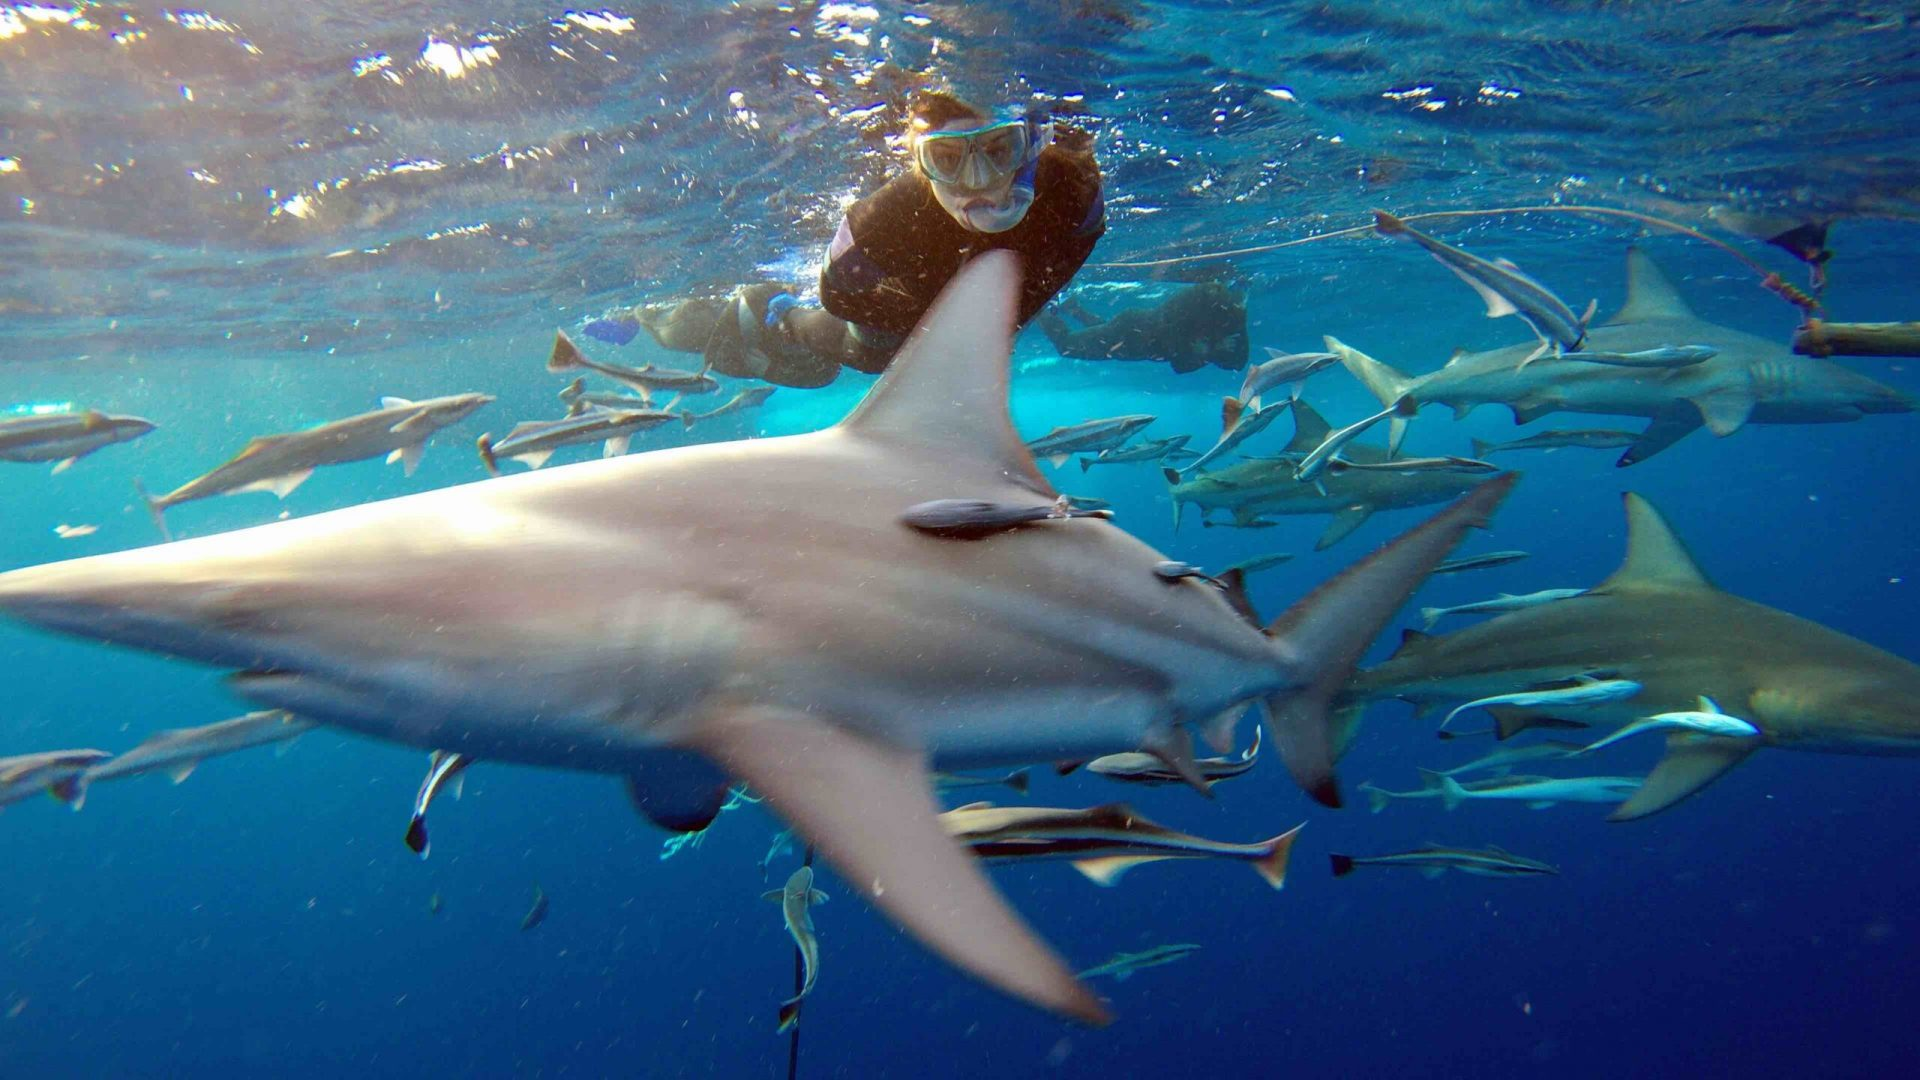 Aliwal Shoal Shark Cage Diving